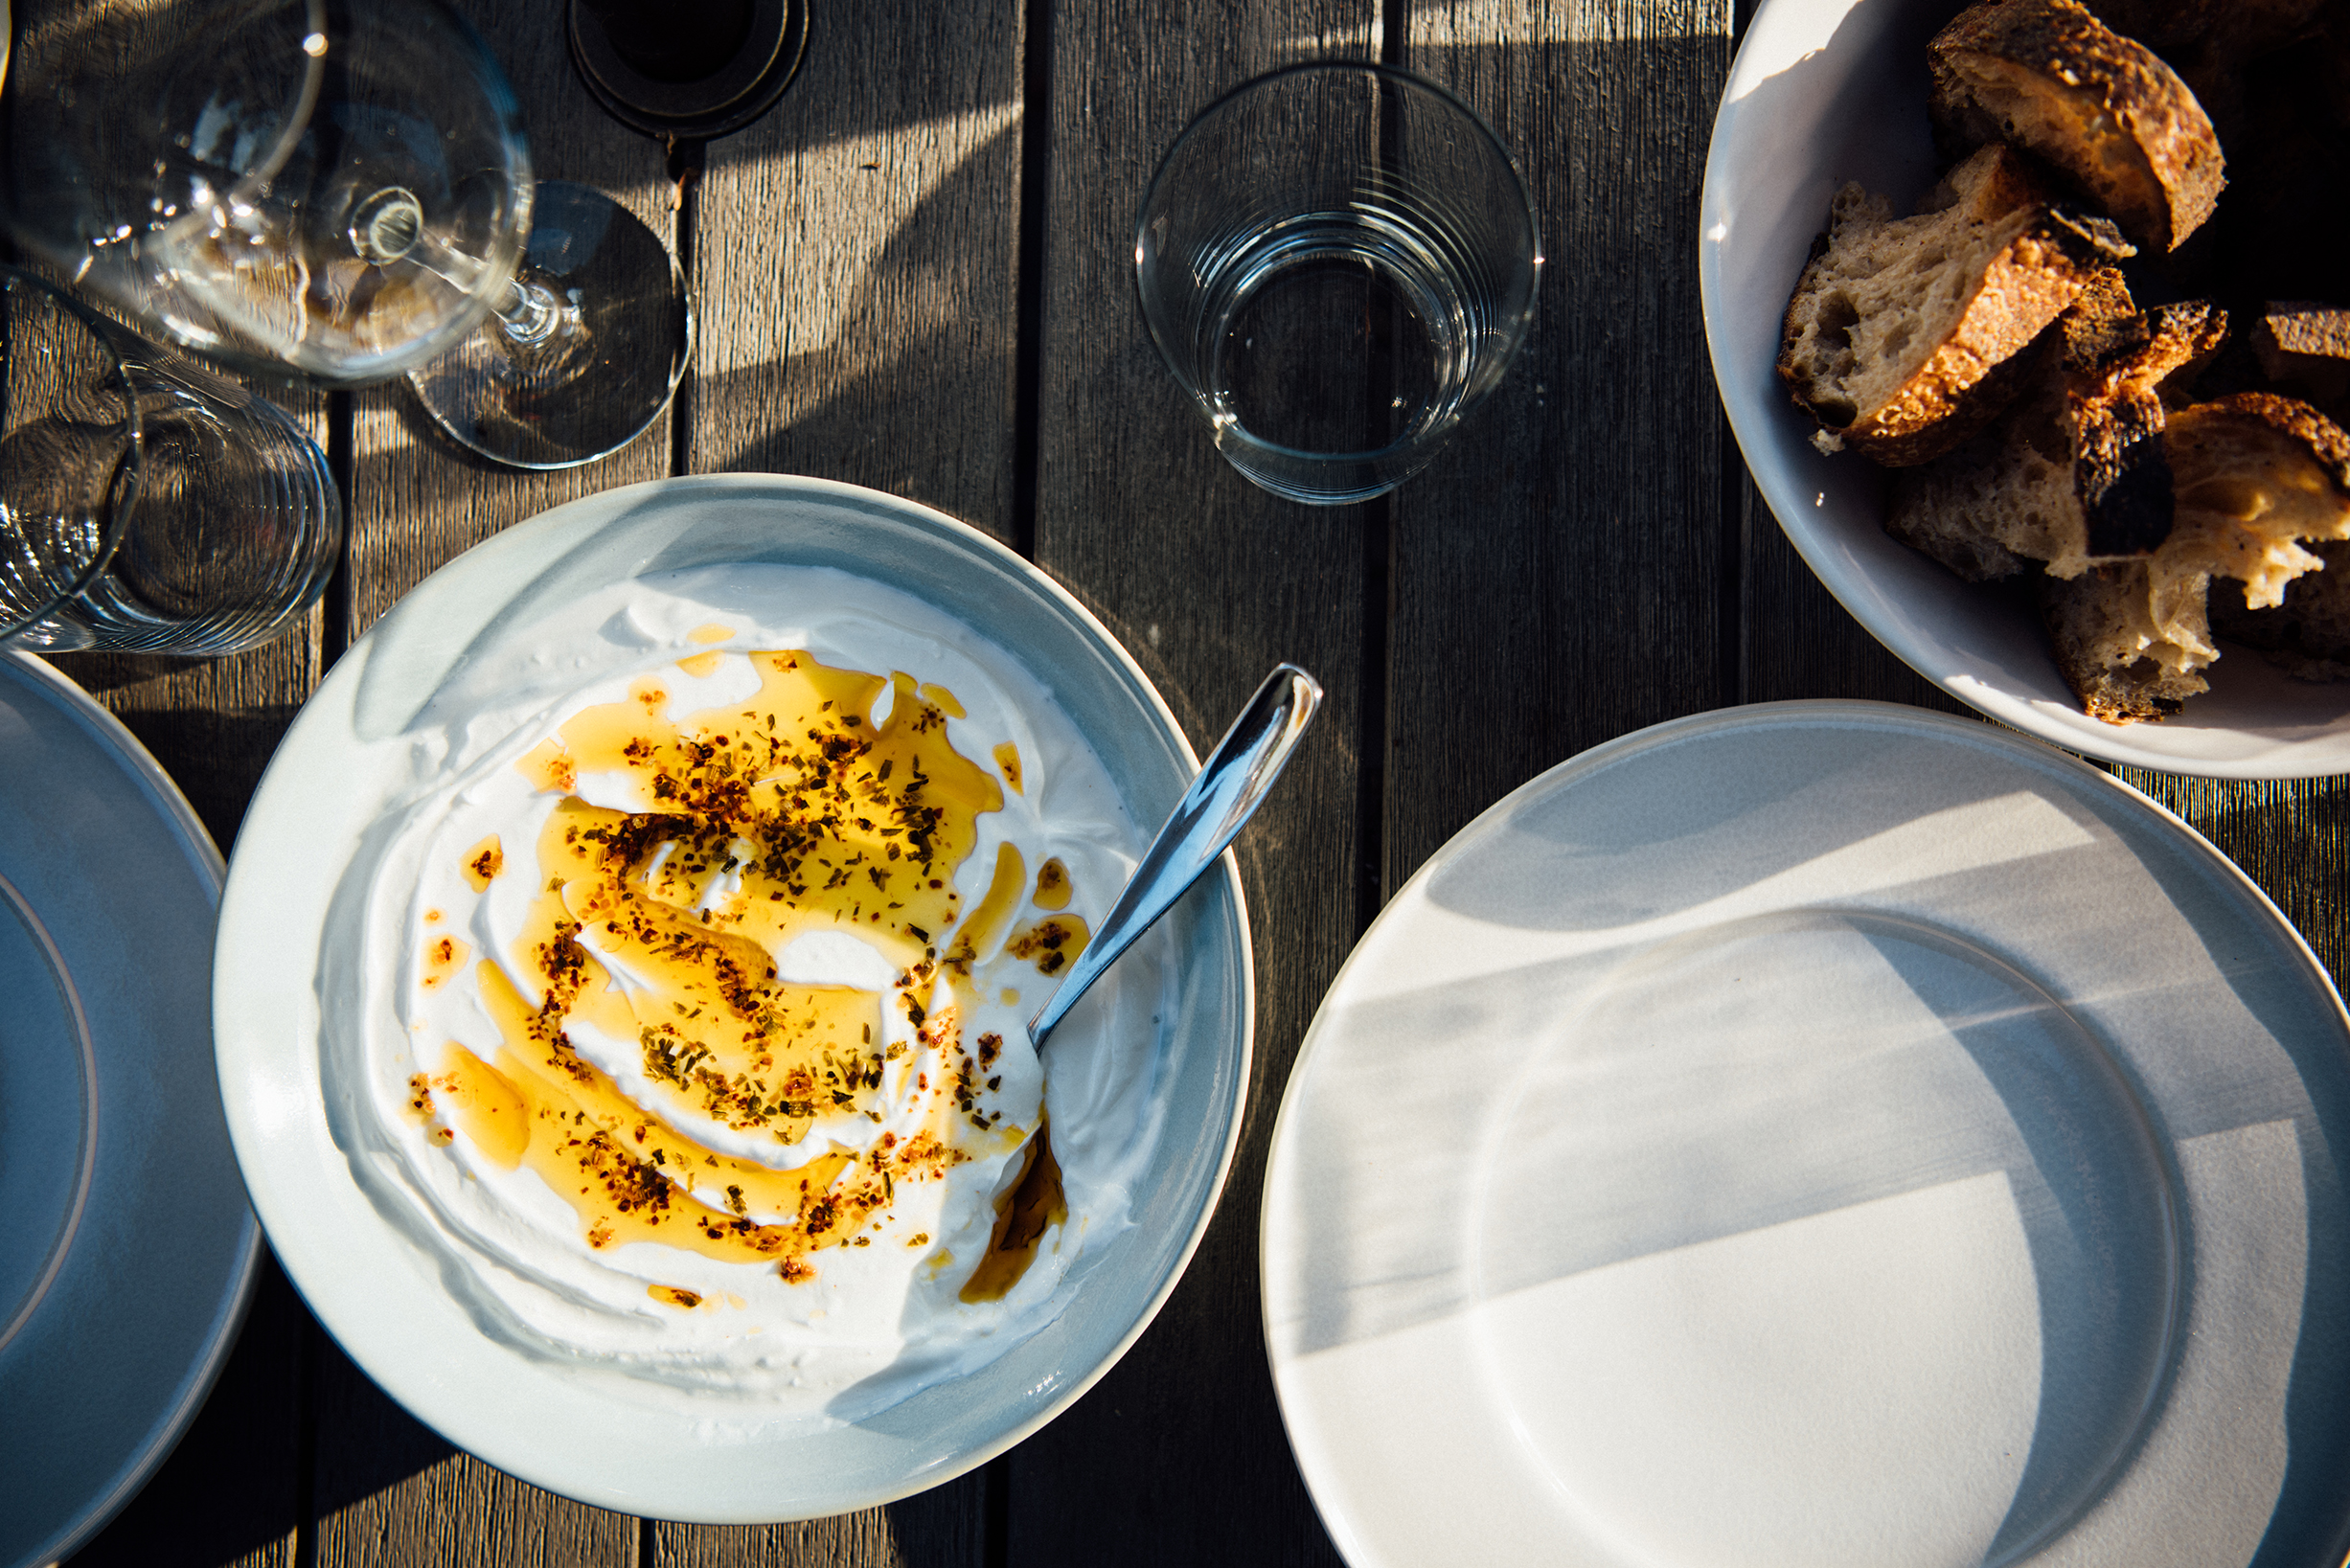 Grilled lamb chops with garam masala and cumin| Nik Sharma